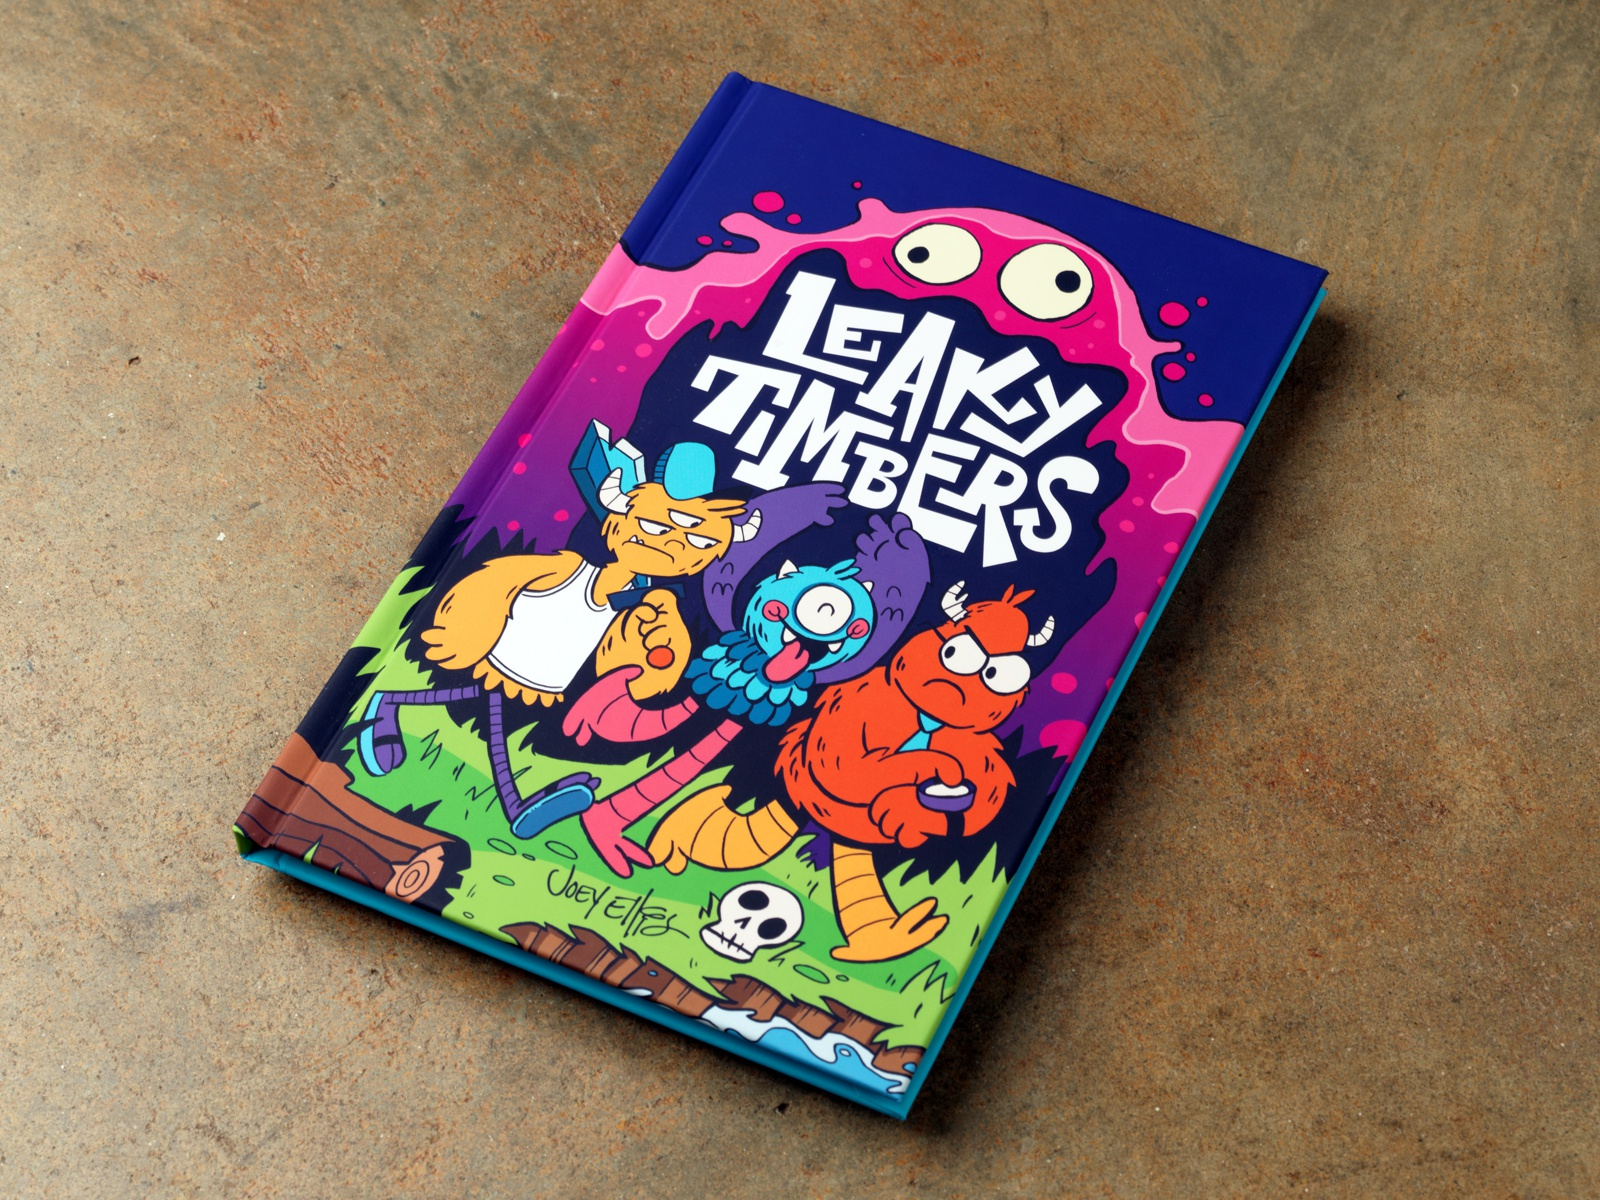 Leaky timbers book